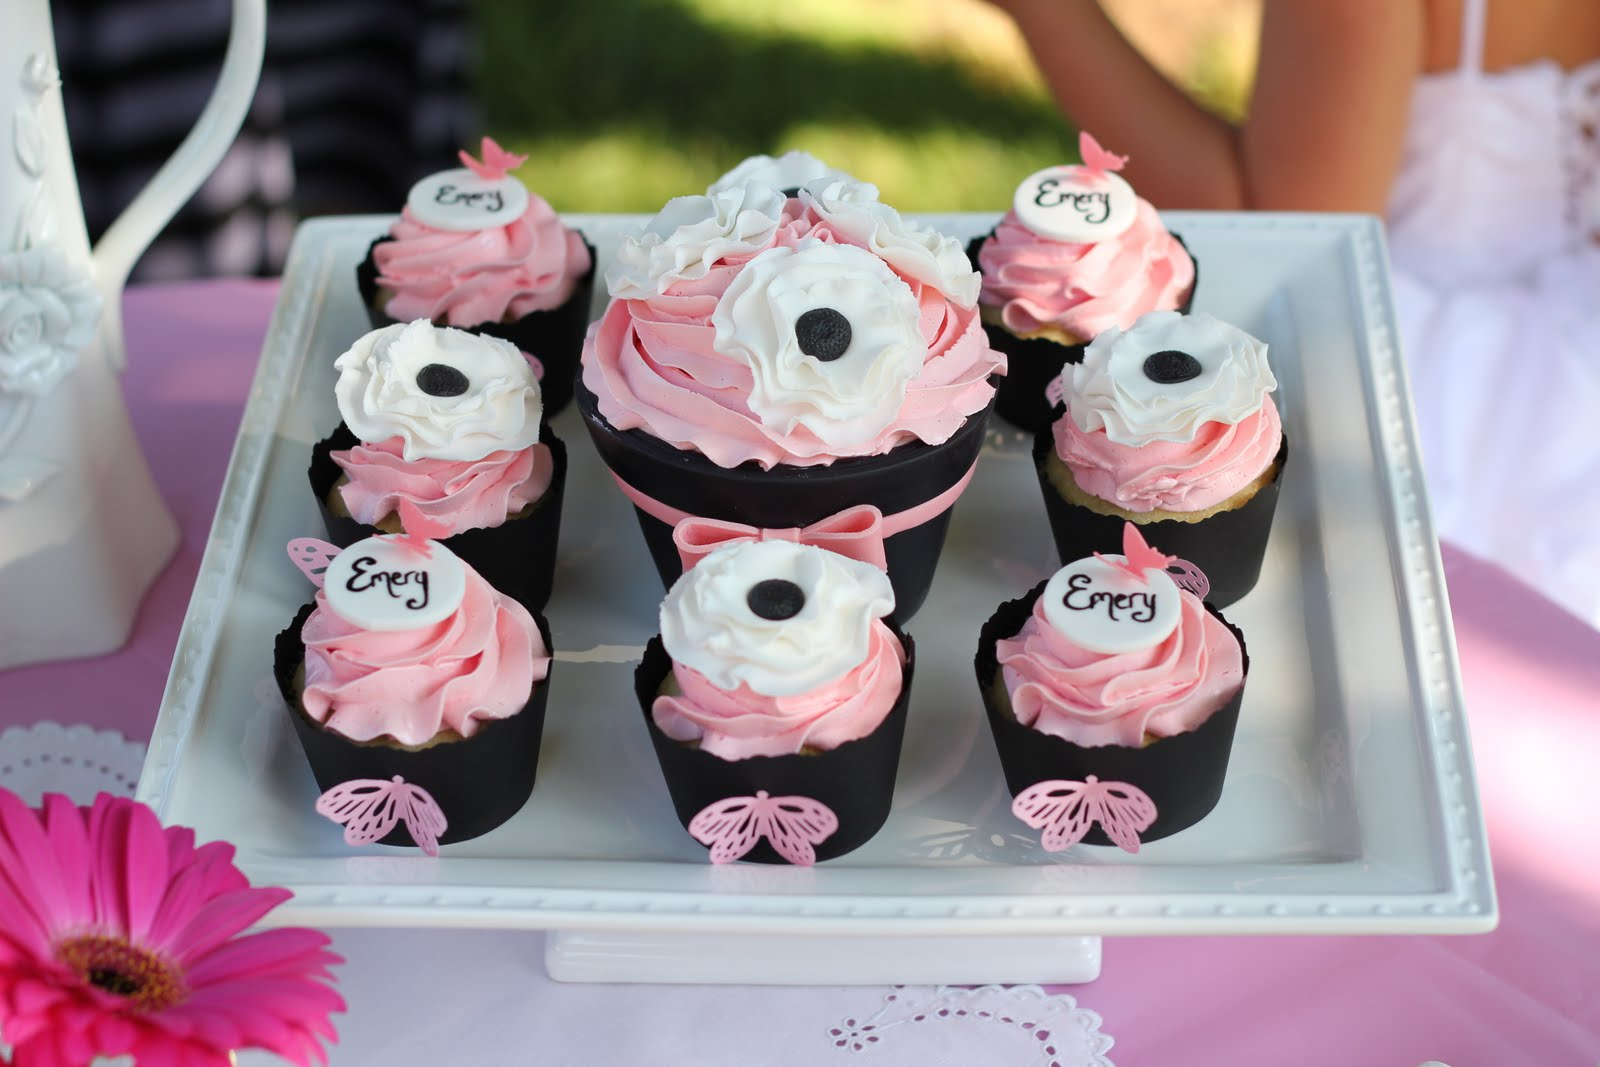 Happy Birthday Emery Jessica Harris Cake Design